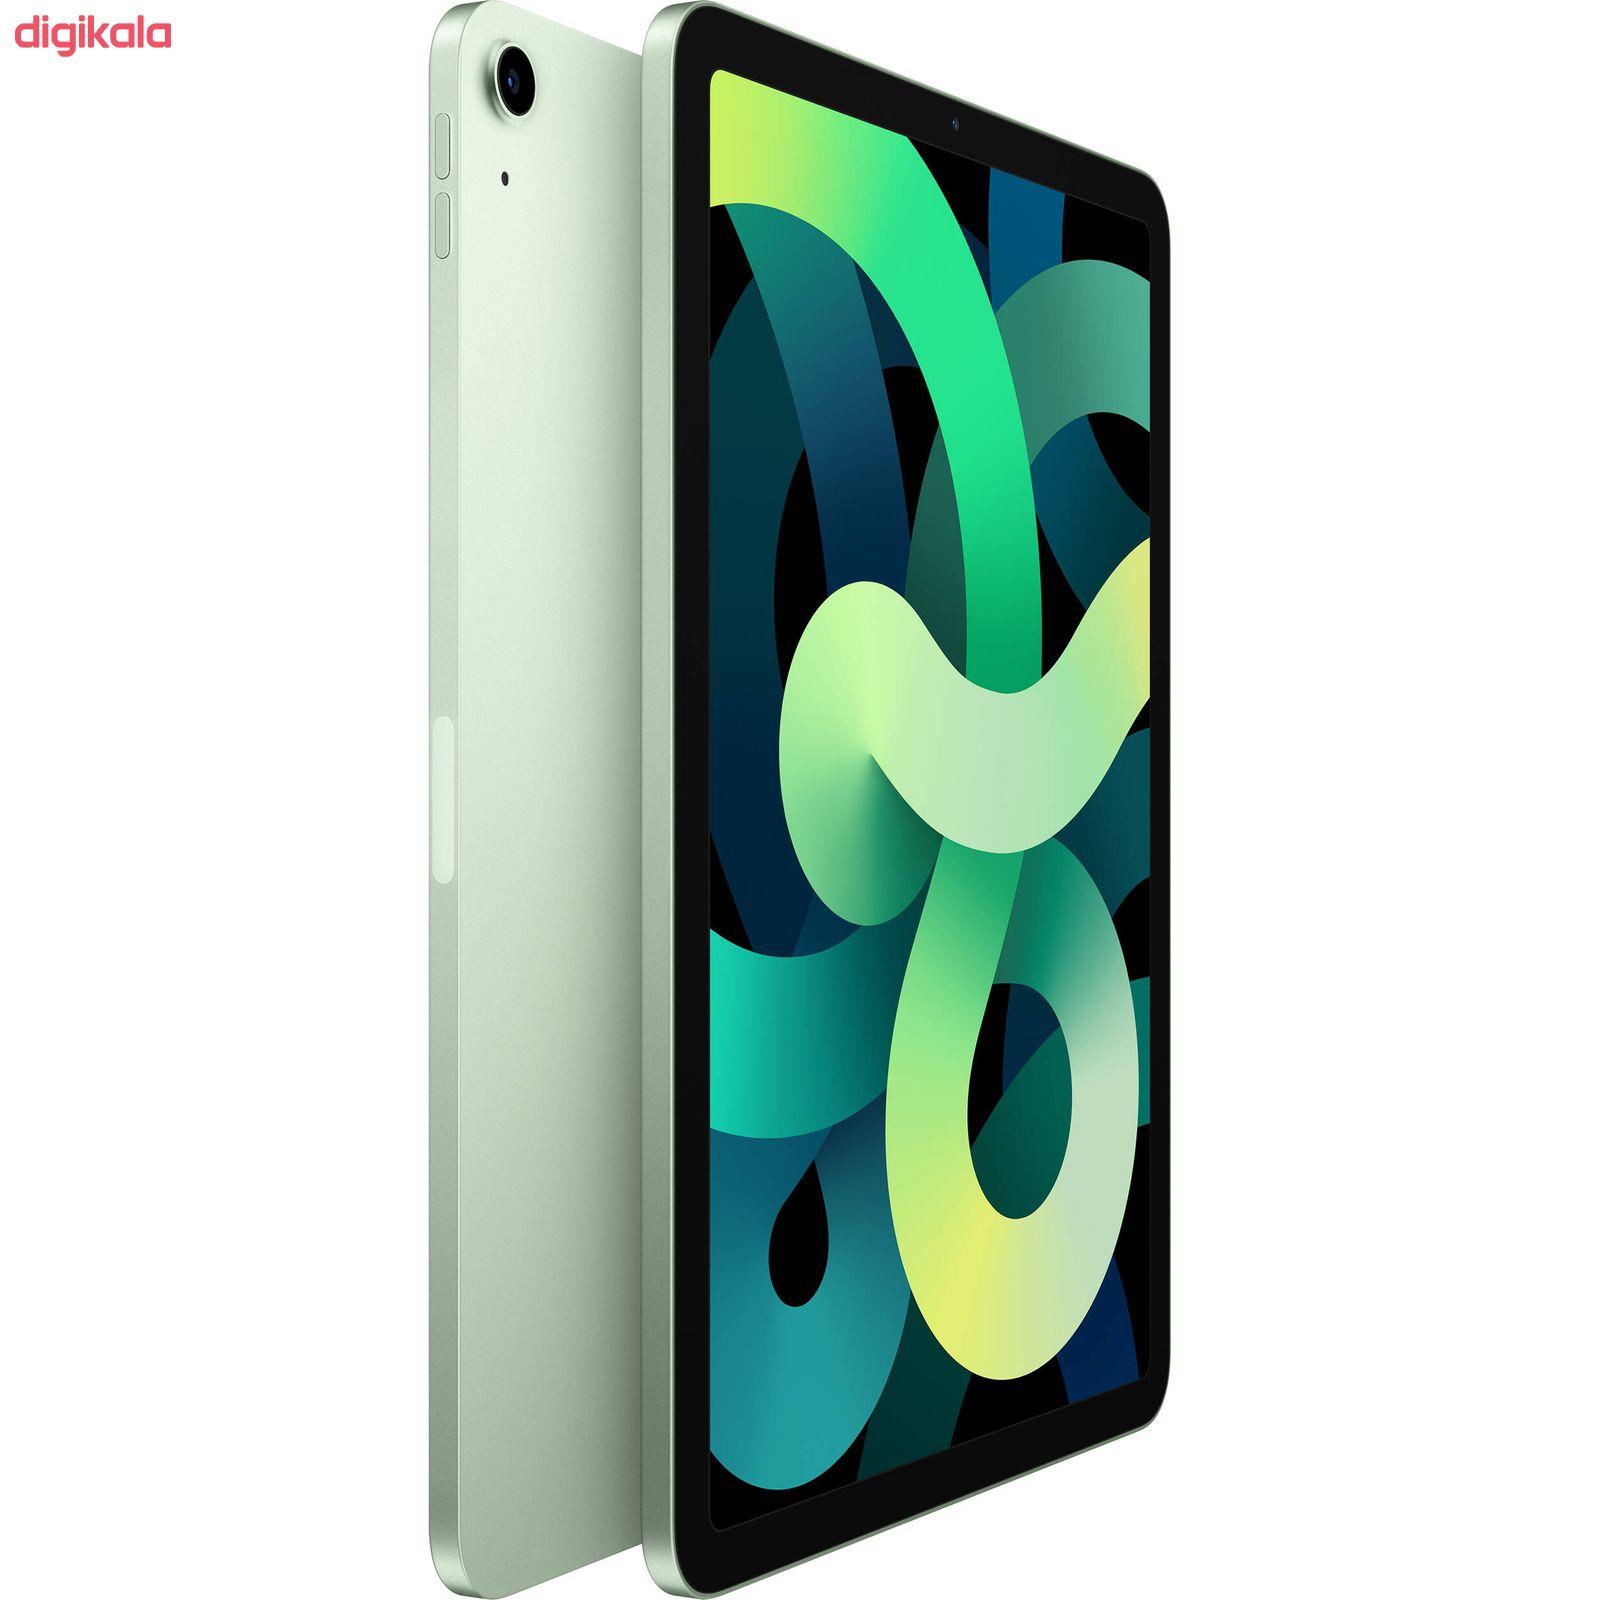 تبلت اپل مدل iPad Air 10.9 inch 2020 WiFi ظرفیت 64 گیگابایت  main 1 8